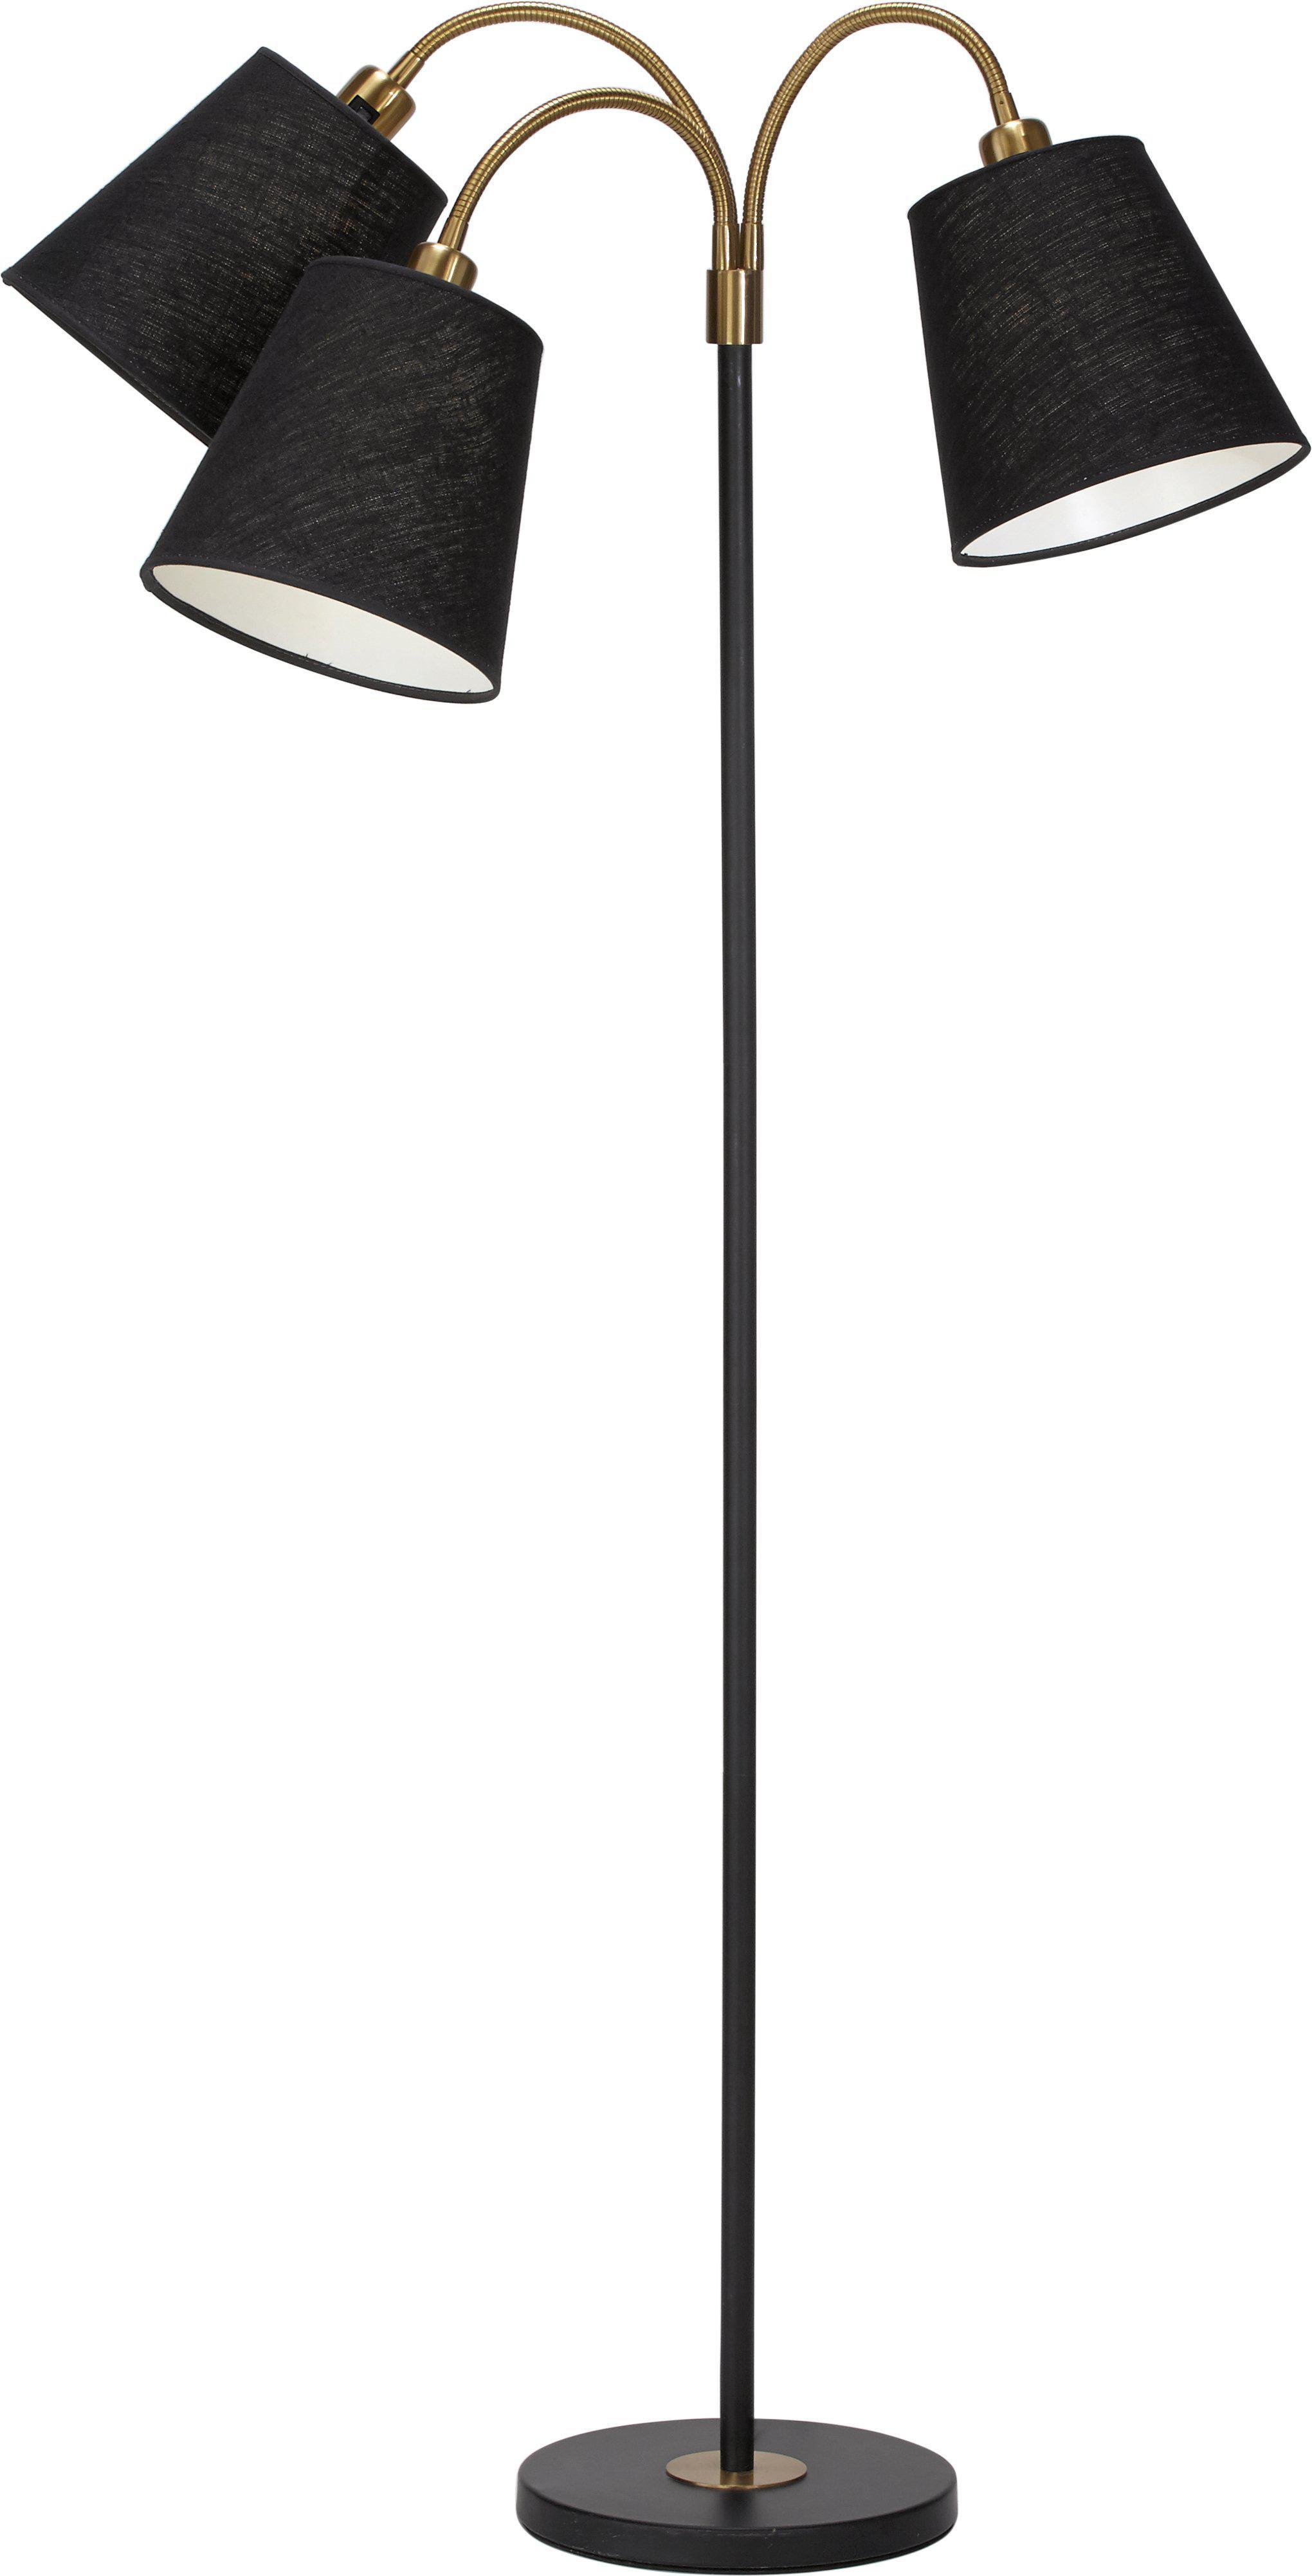 Gulvlampe Cia 3 armet Med lampeskjerm Cia | Confident Living